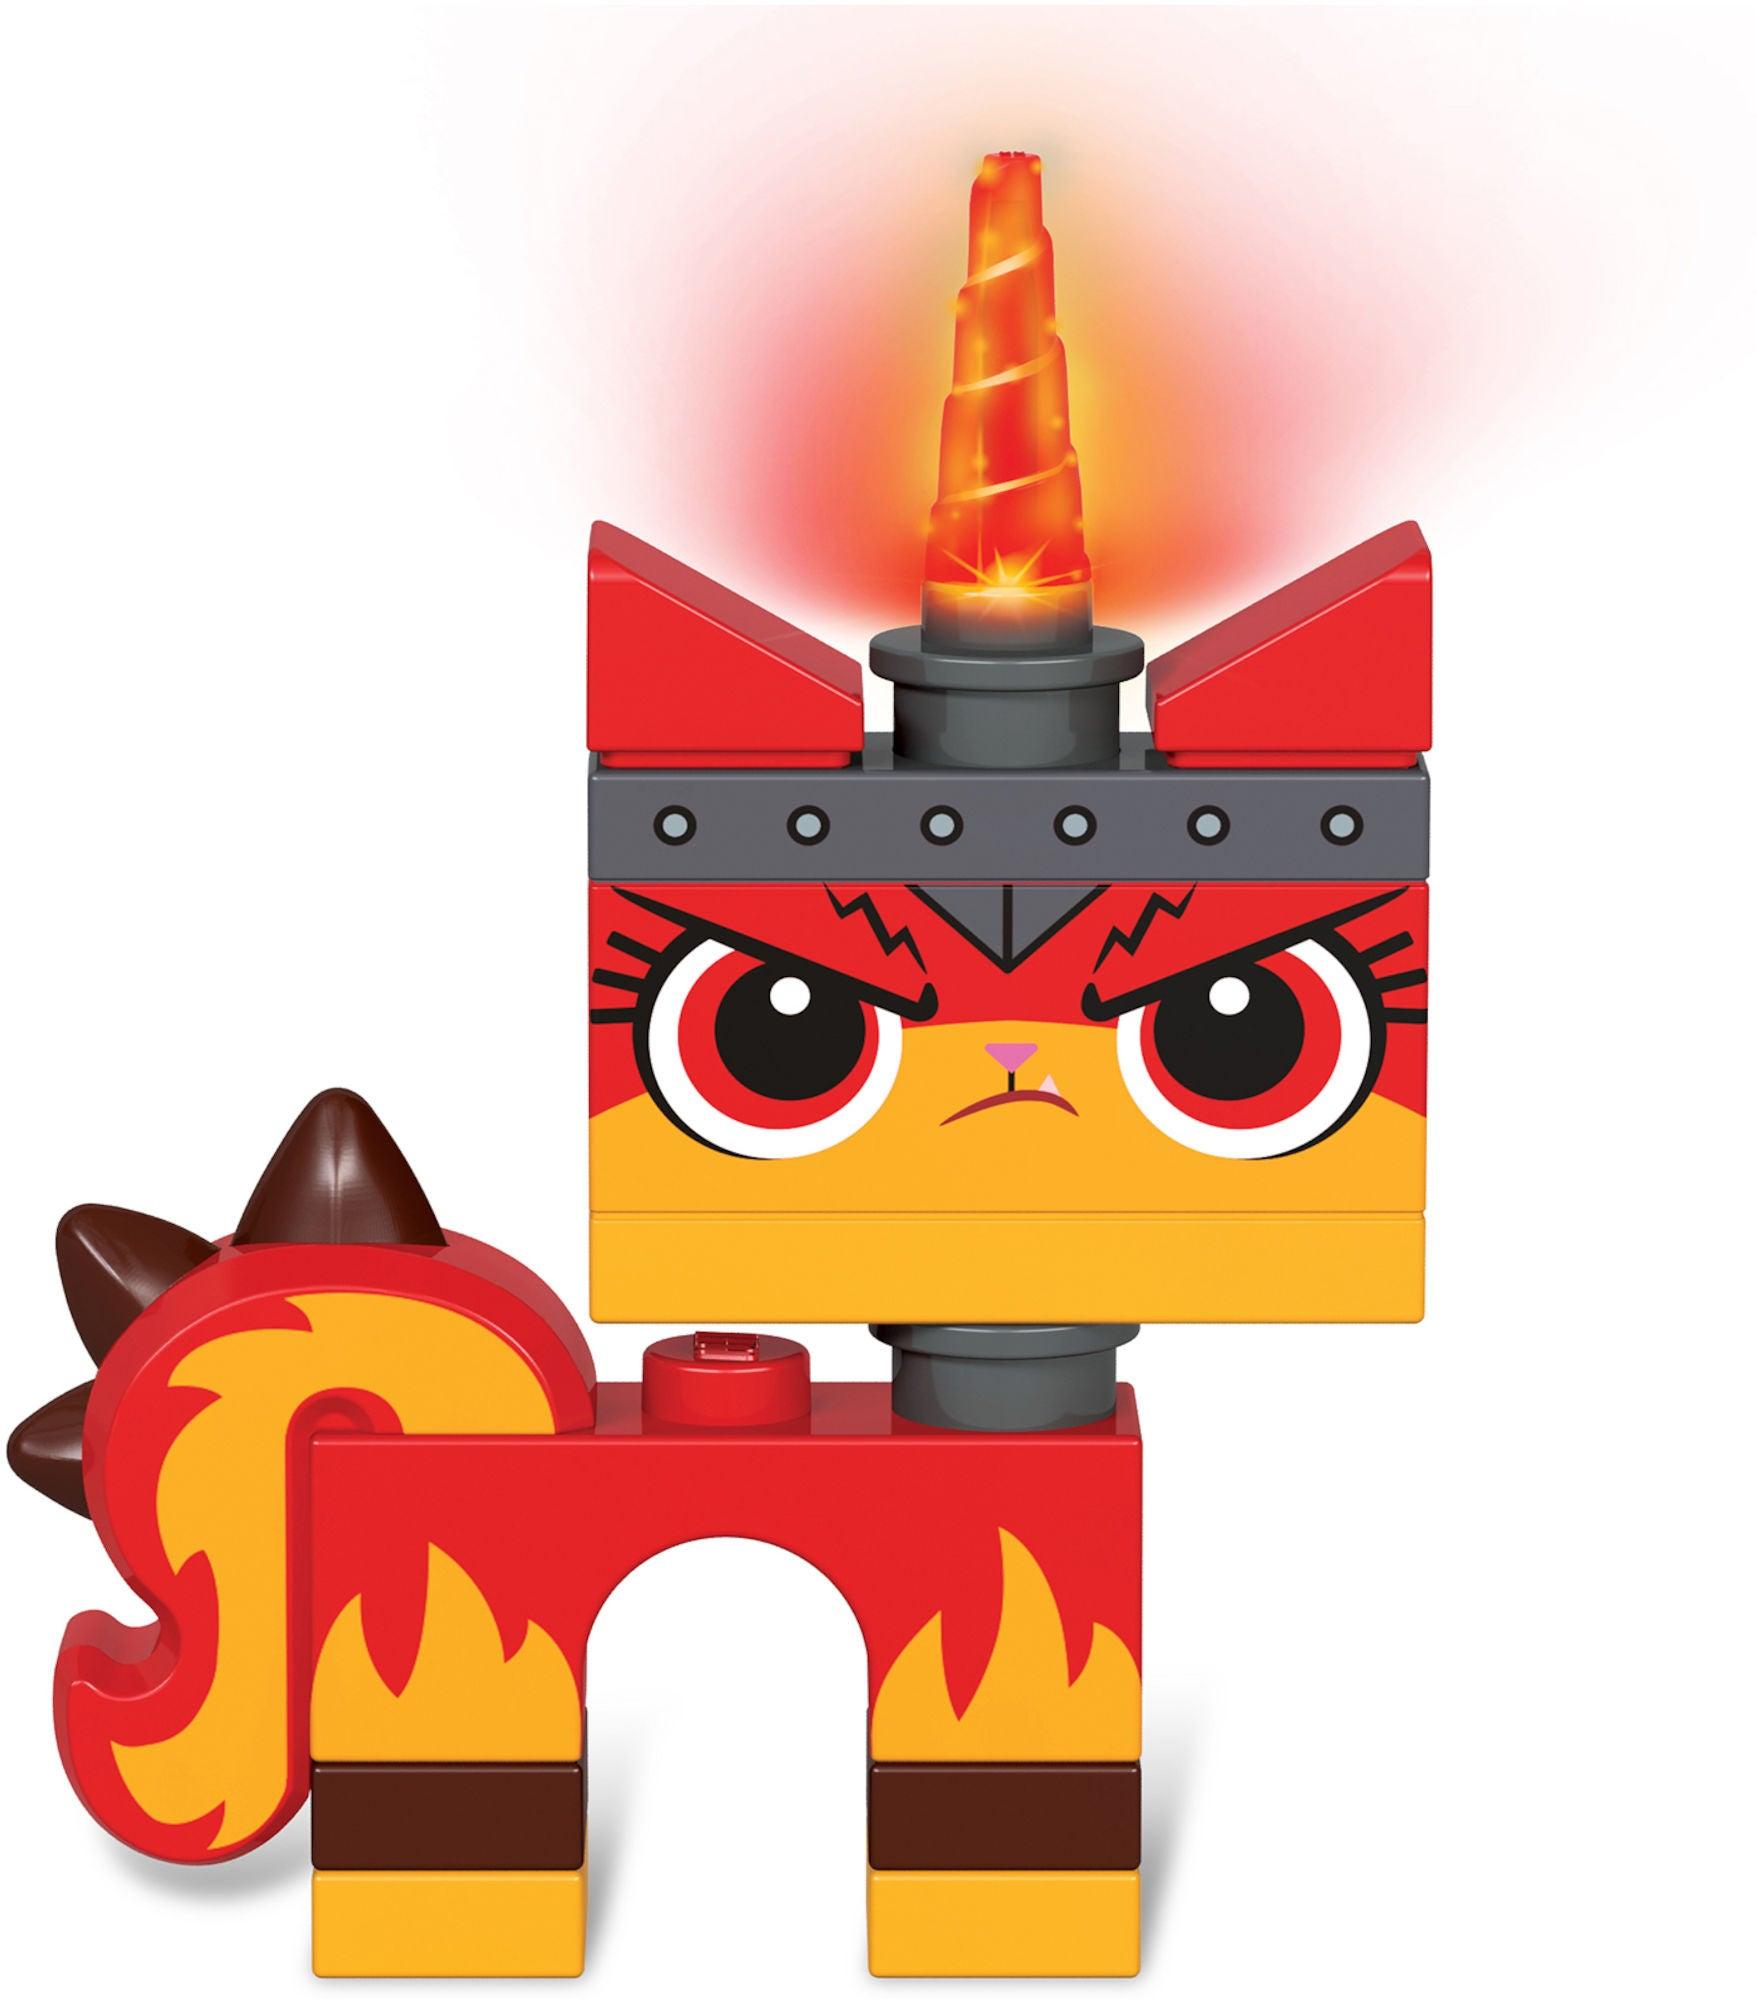 LEGO Taskulamppu Angry Kitty